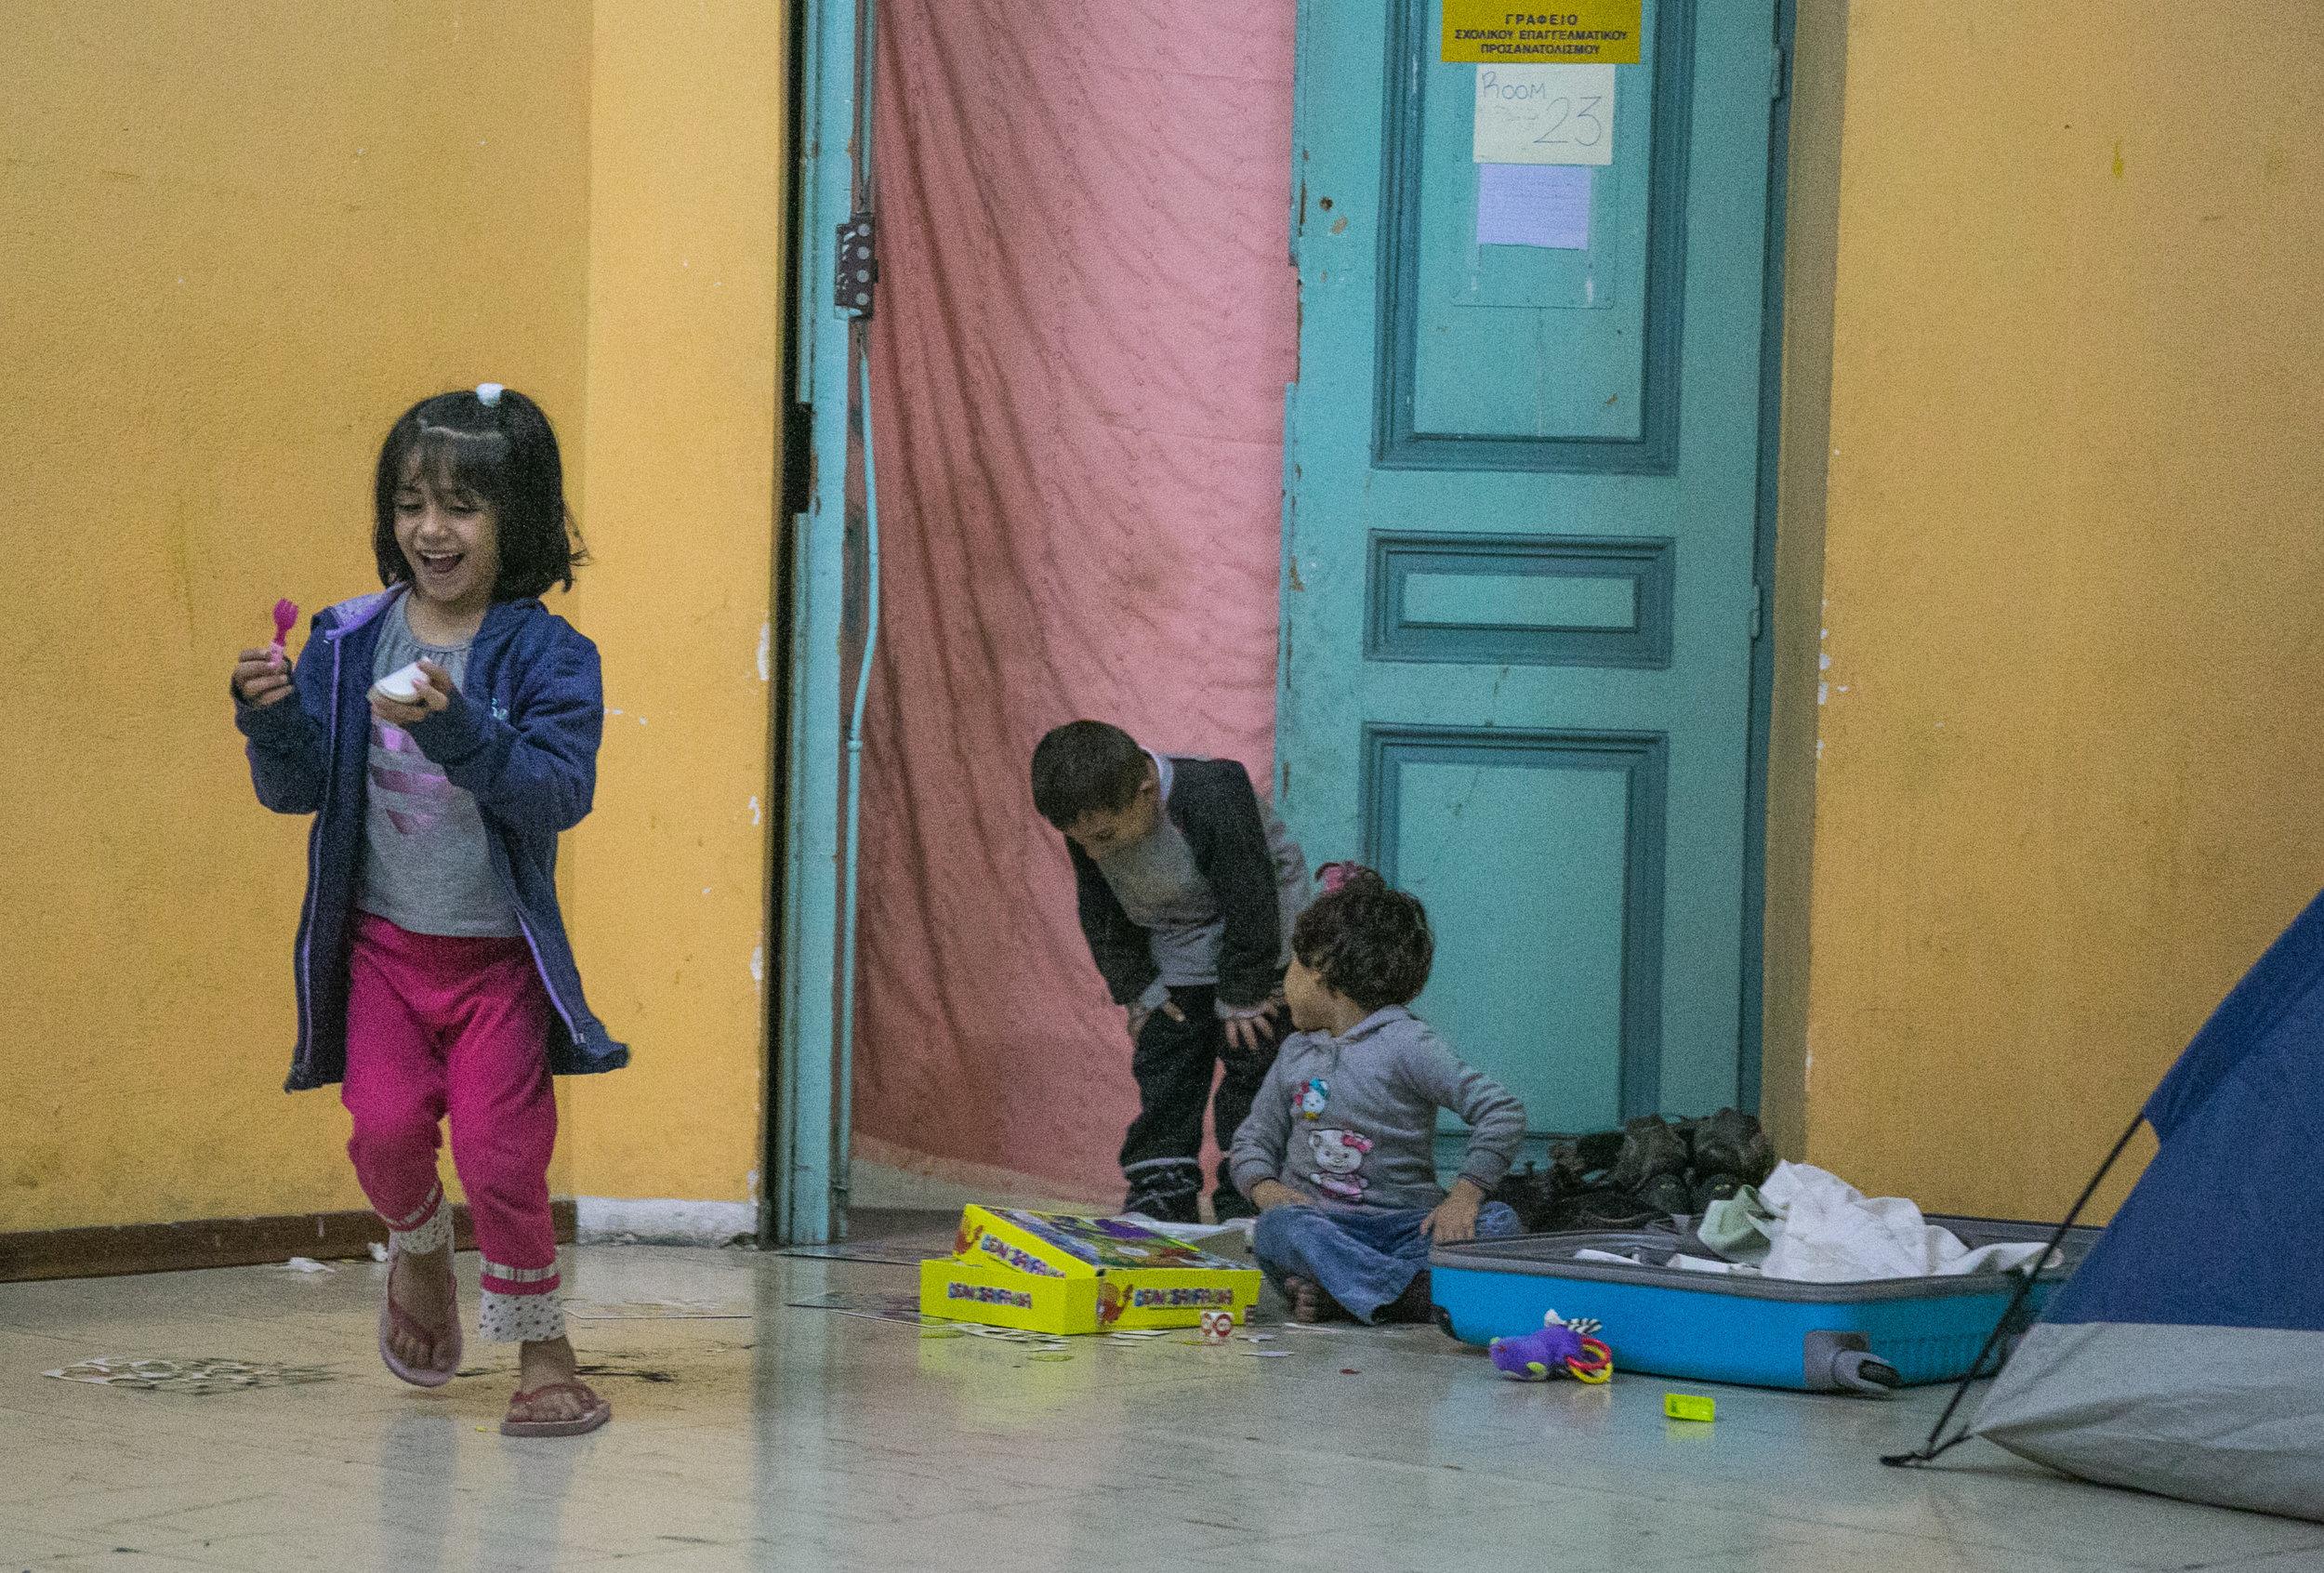 10/19/16 - Children play in the lobby of Jasmine School.